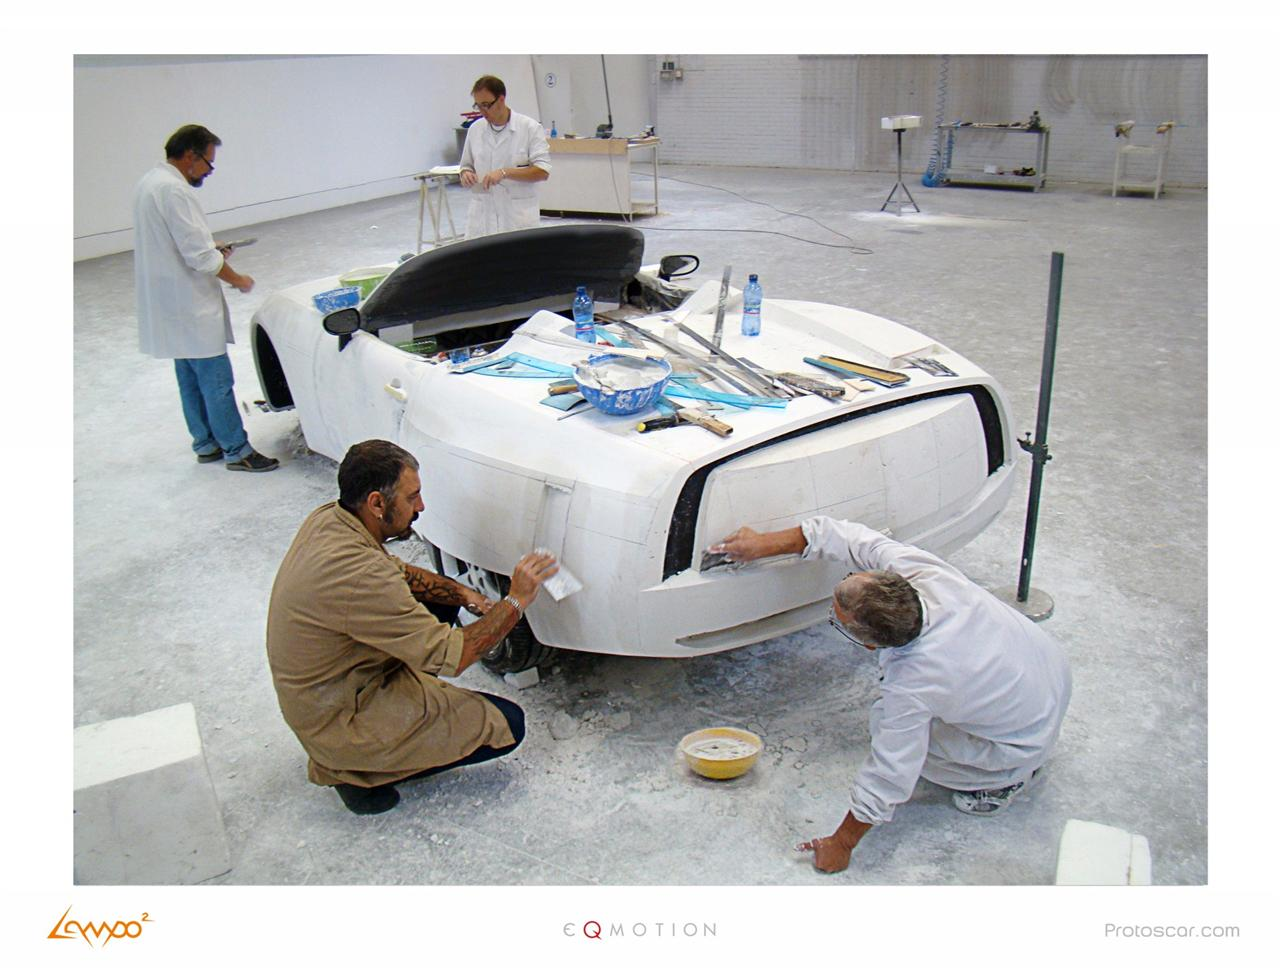 2010 Protoscar Lampo2 Prototype Image